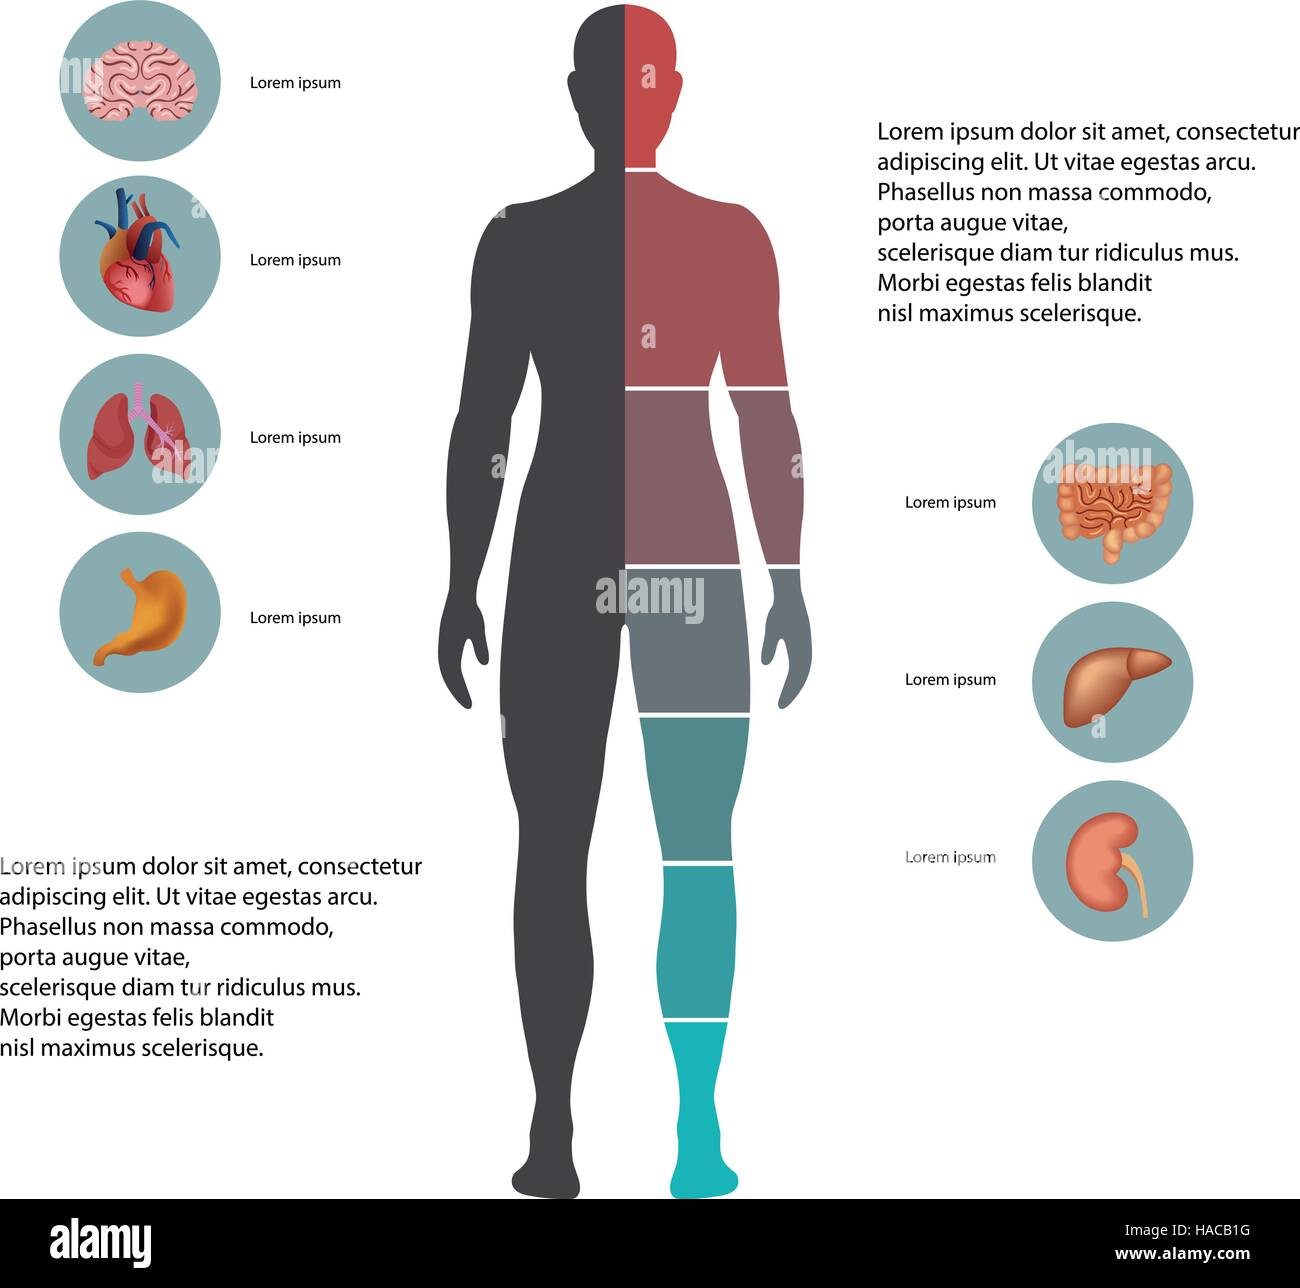 Human Organs Infographic Stockfotos & Human Organs Infographic ...